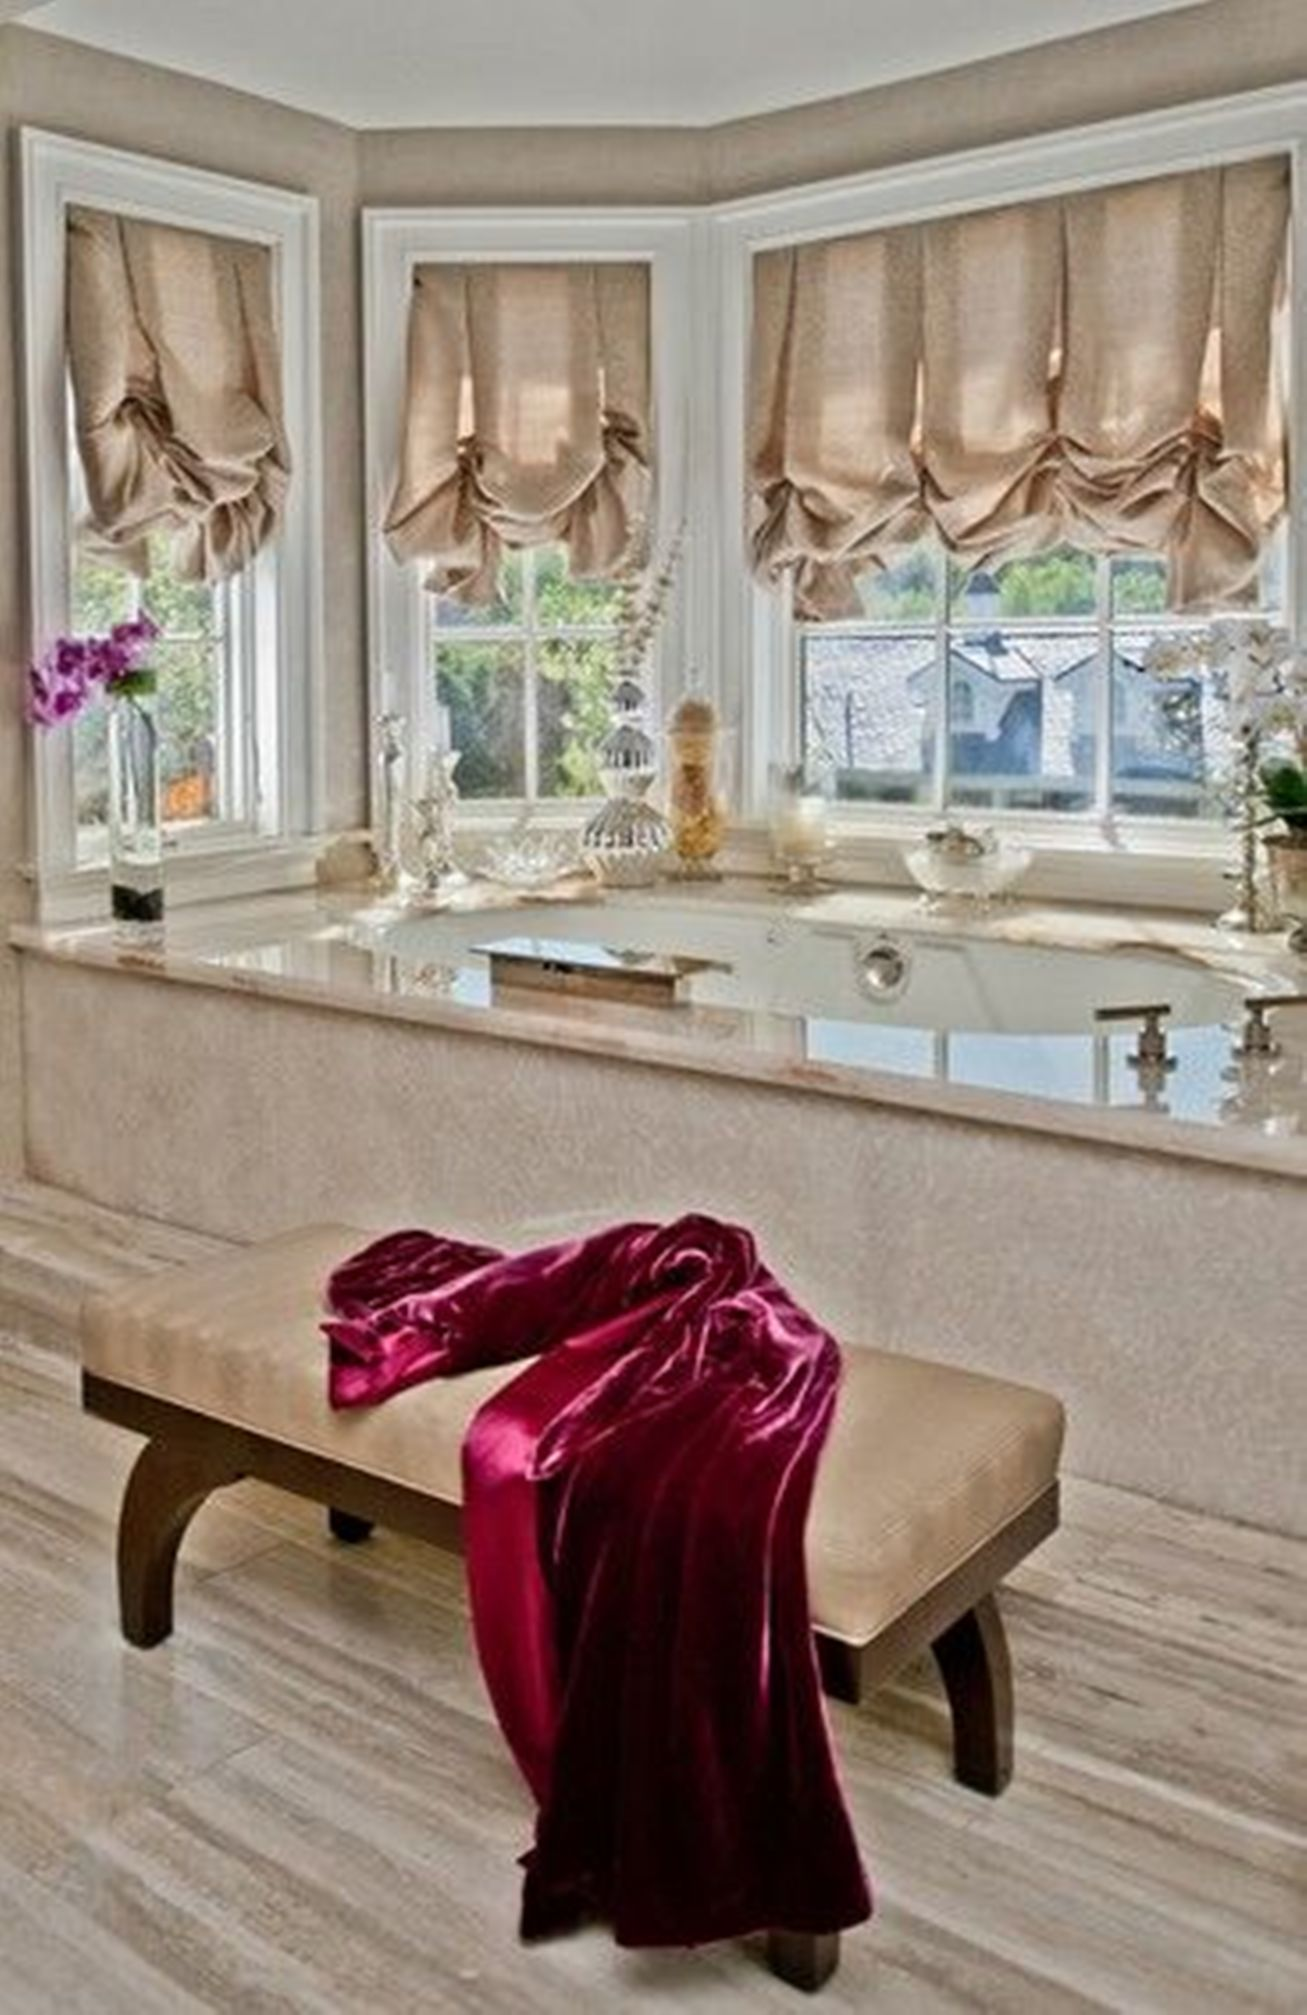 Bathroom Window Treatments Balloon Shades Over For Neutral Bathroom